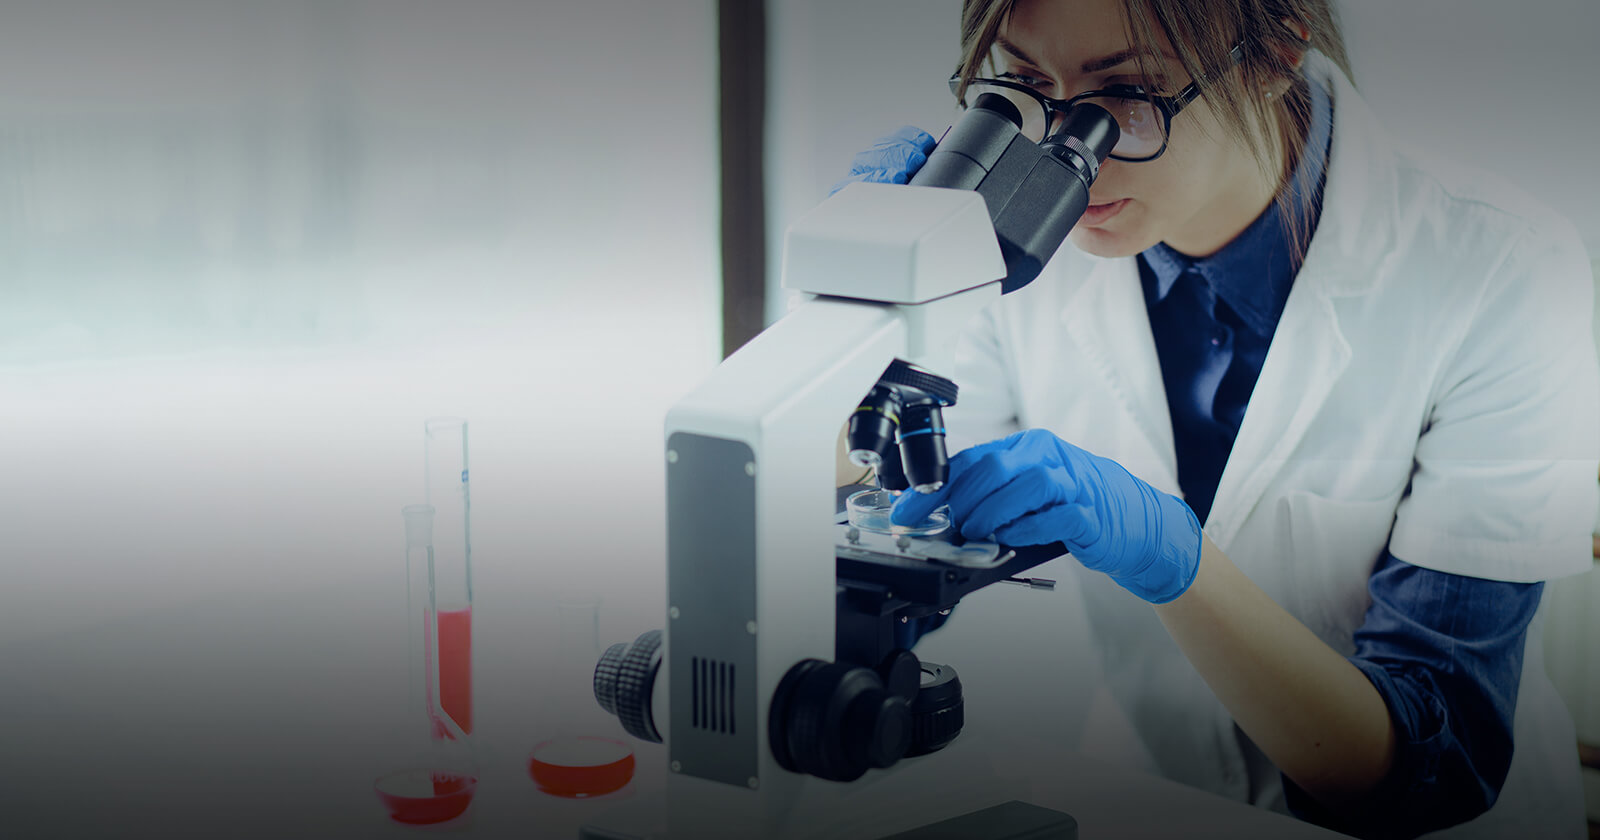 La biolog a de la celula humana